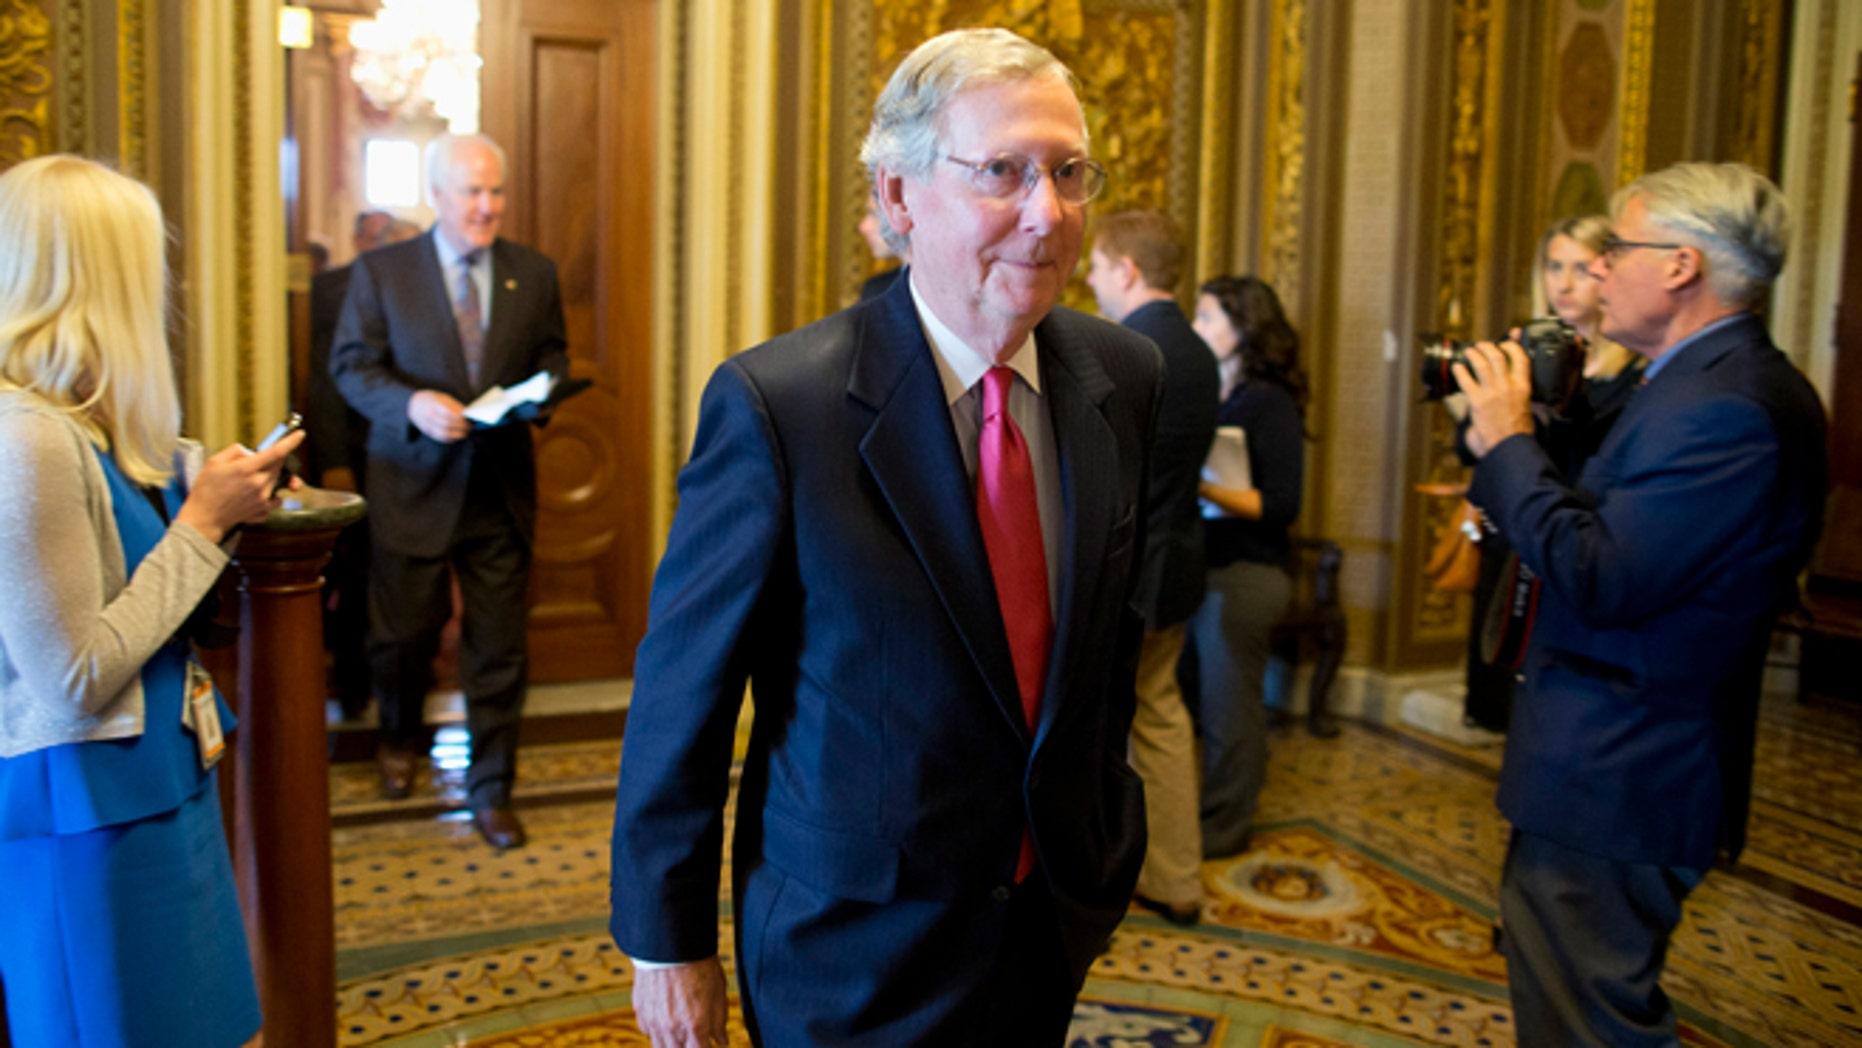 Oct. 8, 2013: Senate Minority Leader Mitch McConnell walks to the Senate floor on Capitol Hill in Washington.